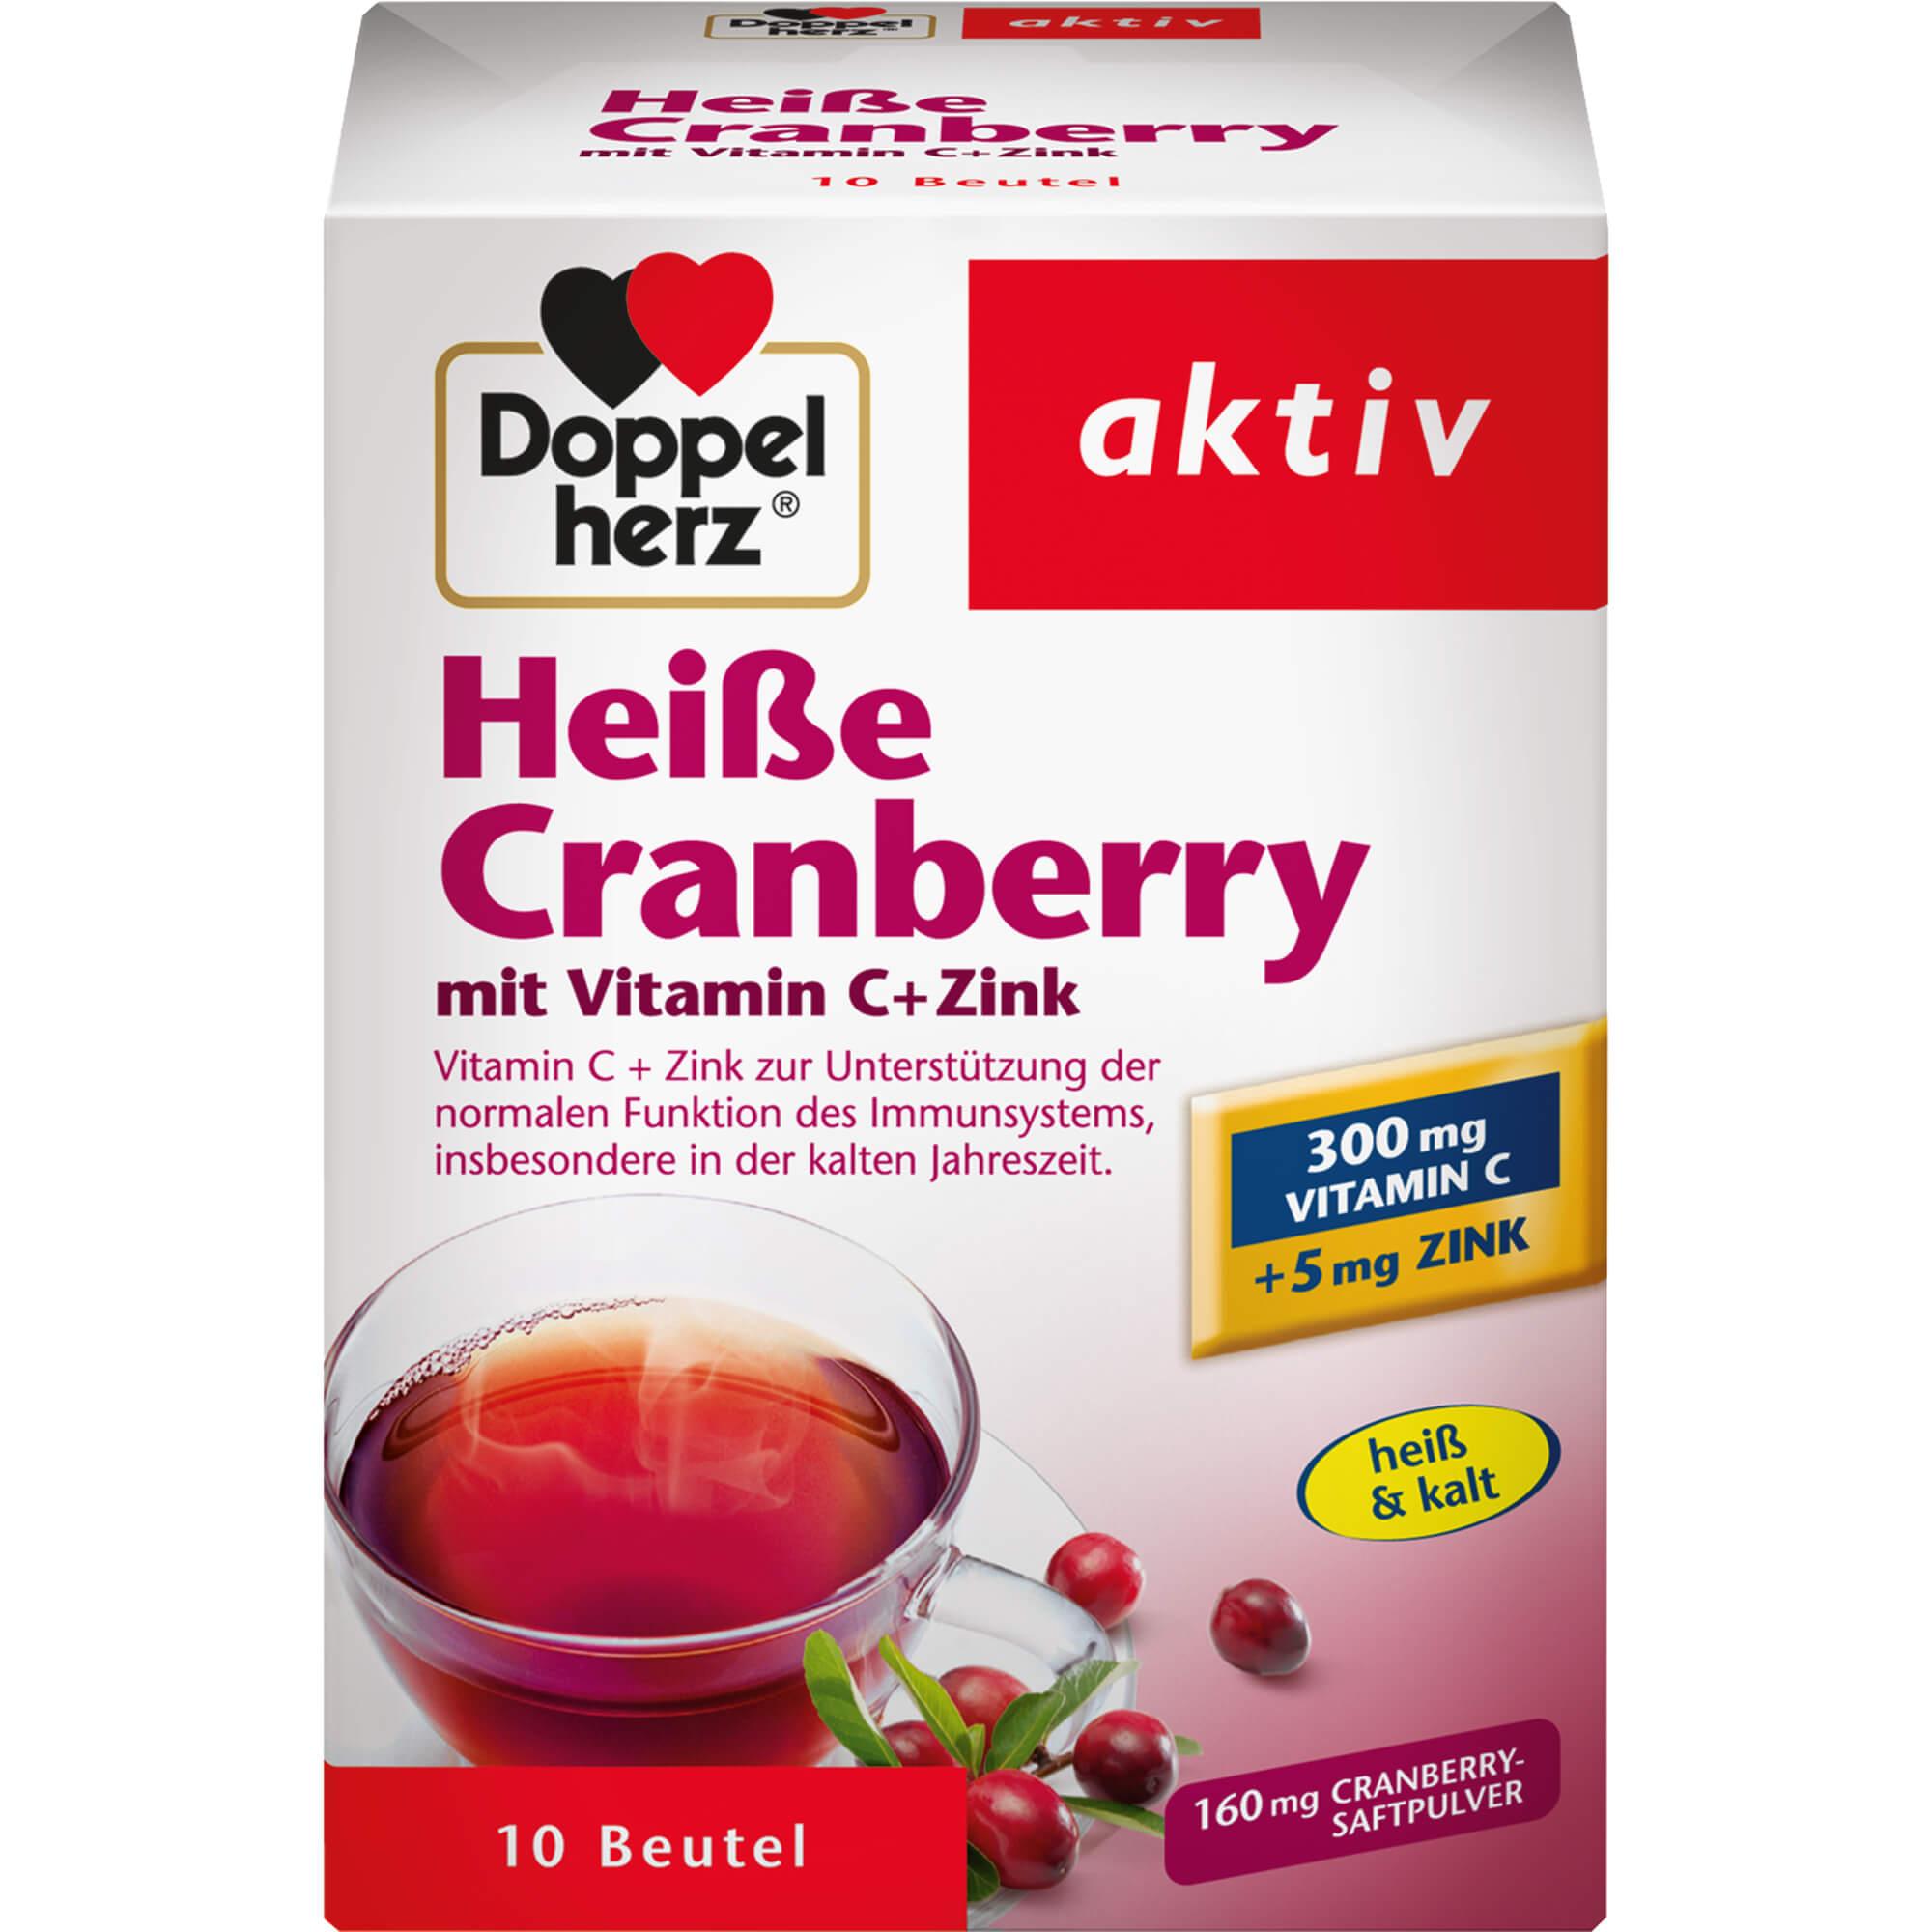 DOPPELHERZ-heisse-Cranberry-m-Vit-C-Zink-Granulat